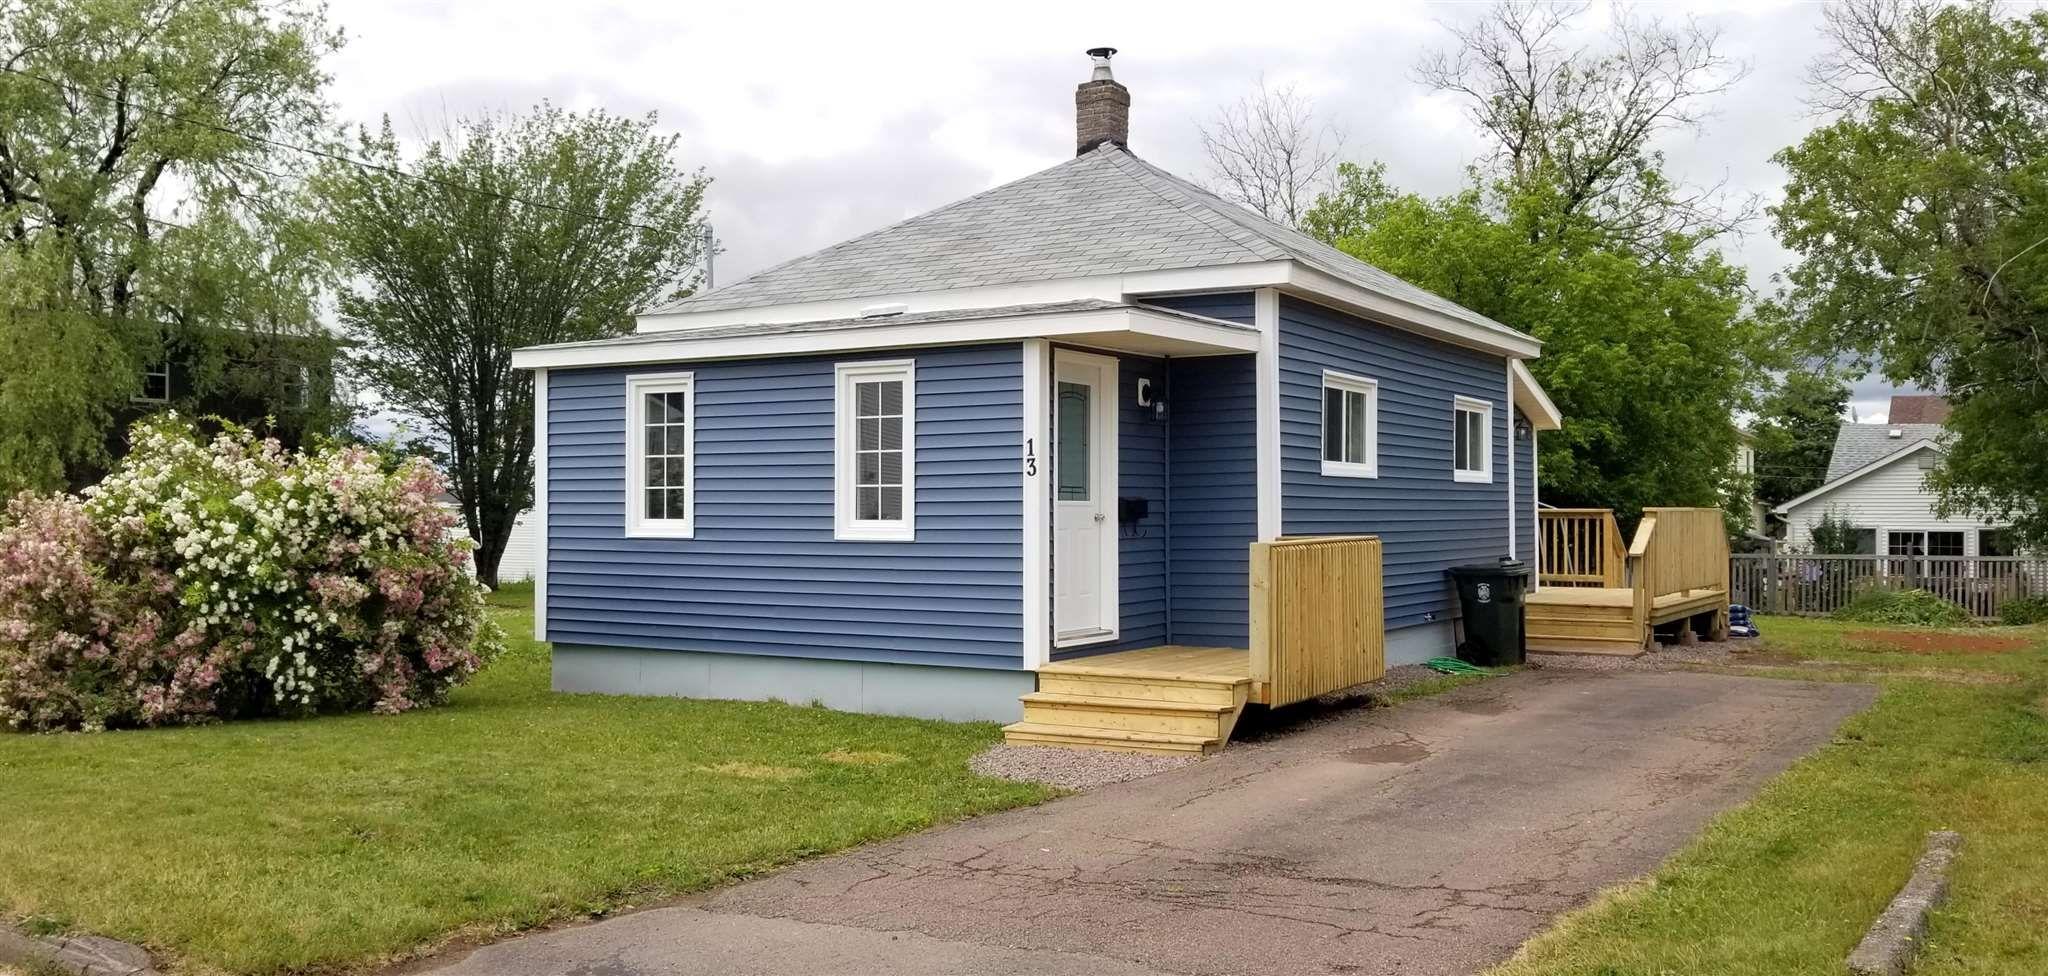 Main Photo: 13 Minto Street in Amherst: 101-Amherst,Brookdale,Warren Residential for sale (Northern Region)  : MLS®# 202116104